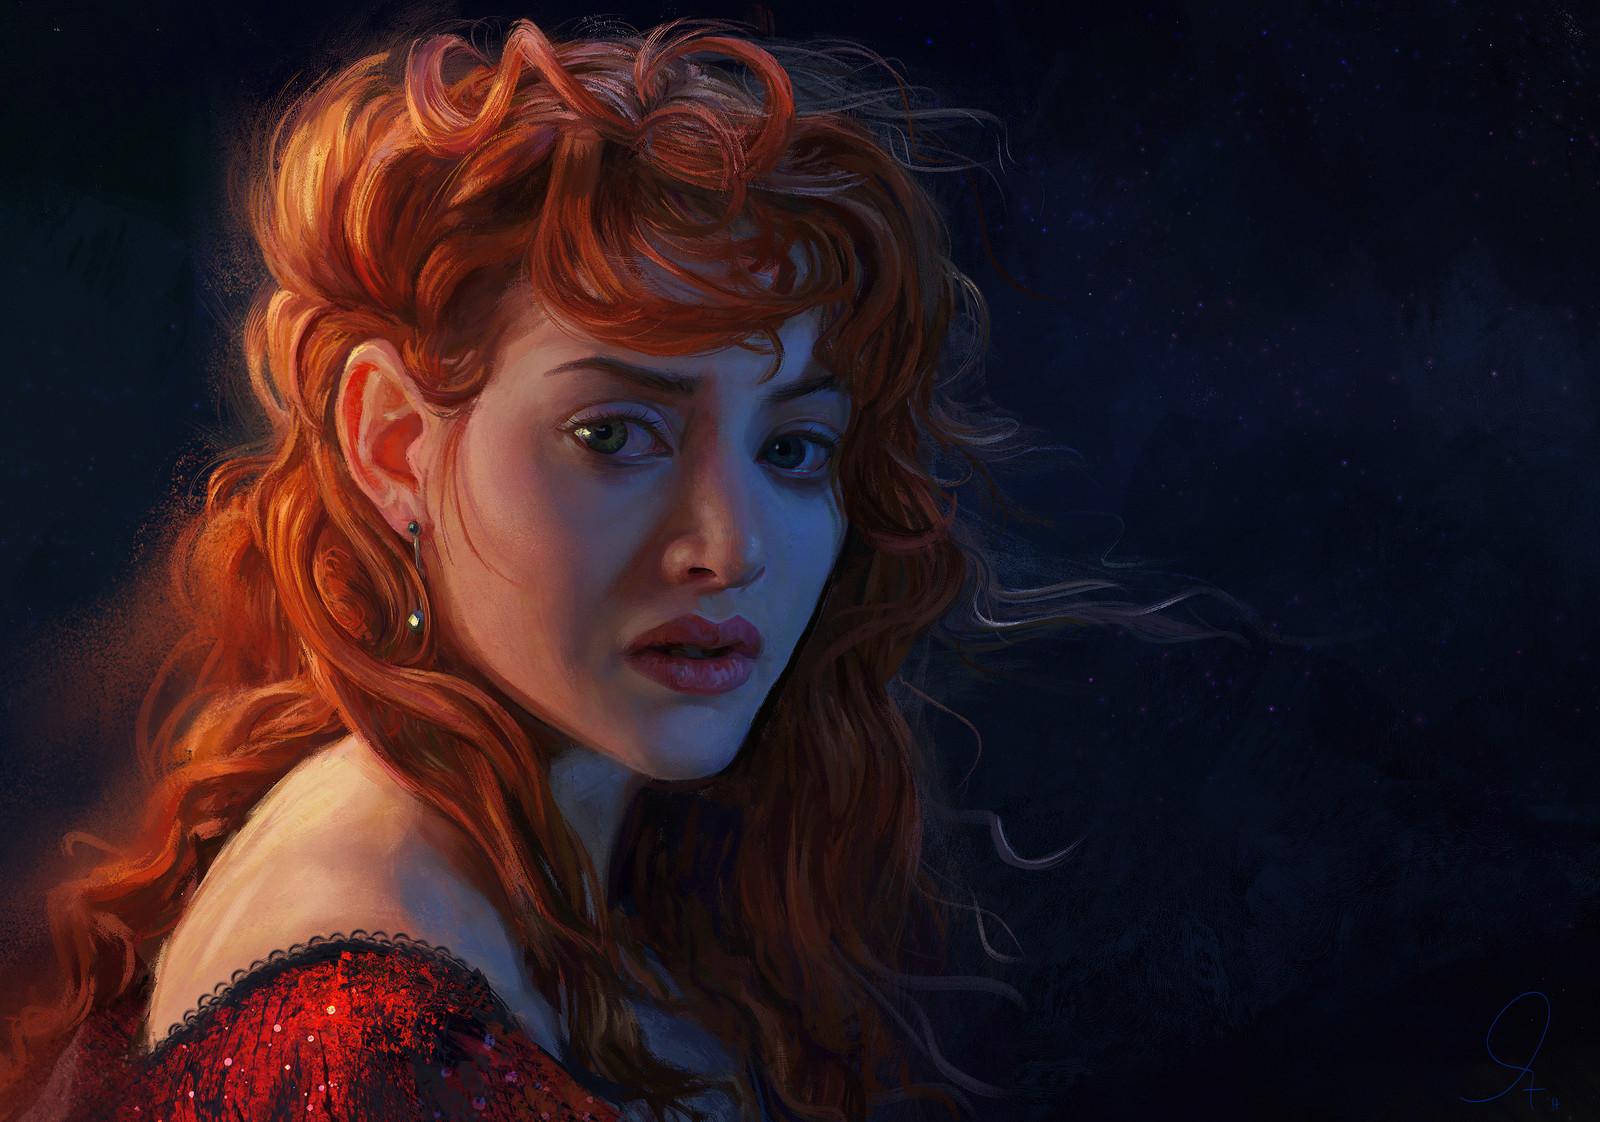 Rose Dewitt Bukater